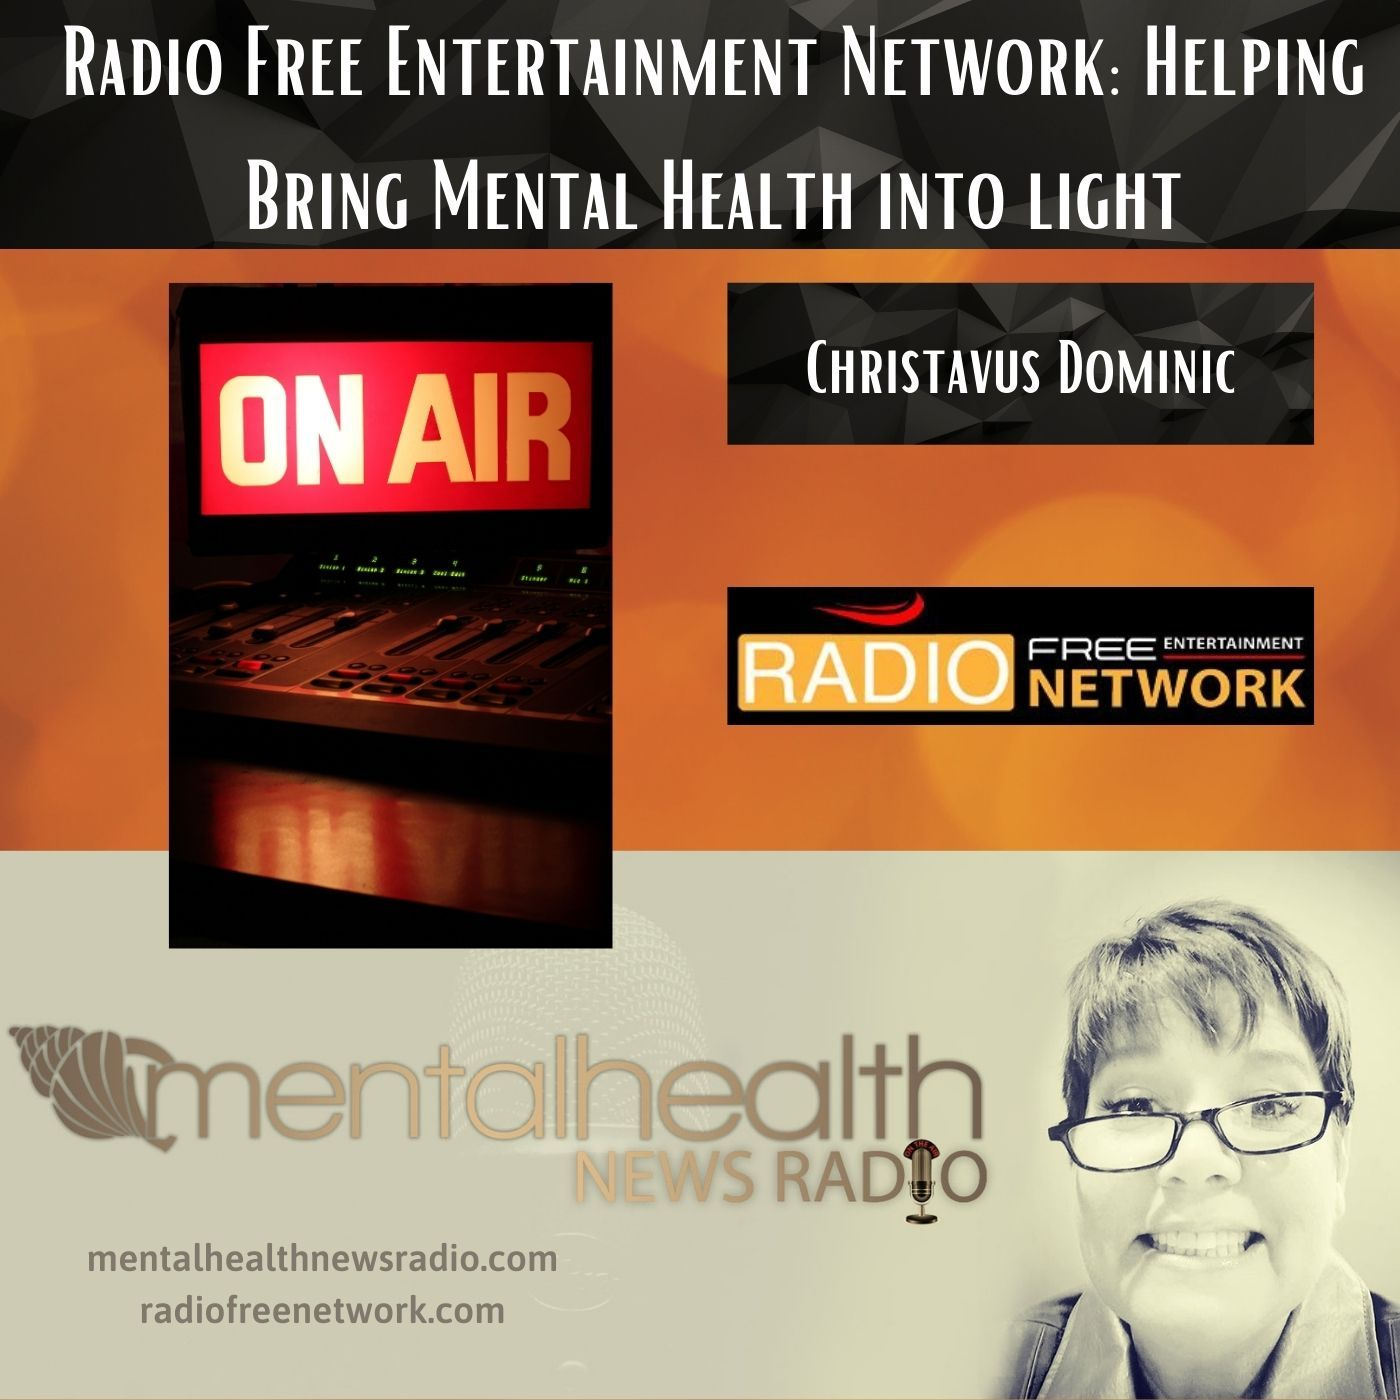 Mental Health News Radio - Radio Free Entertainment Network: Bringing Mental Health into Light with Christavus Dominic.